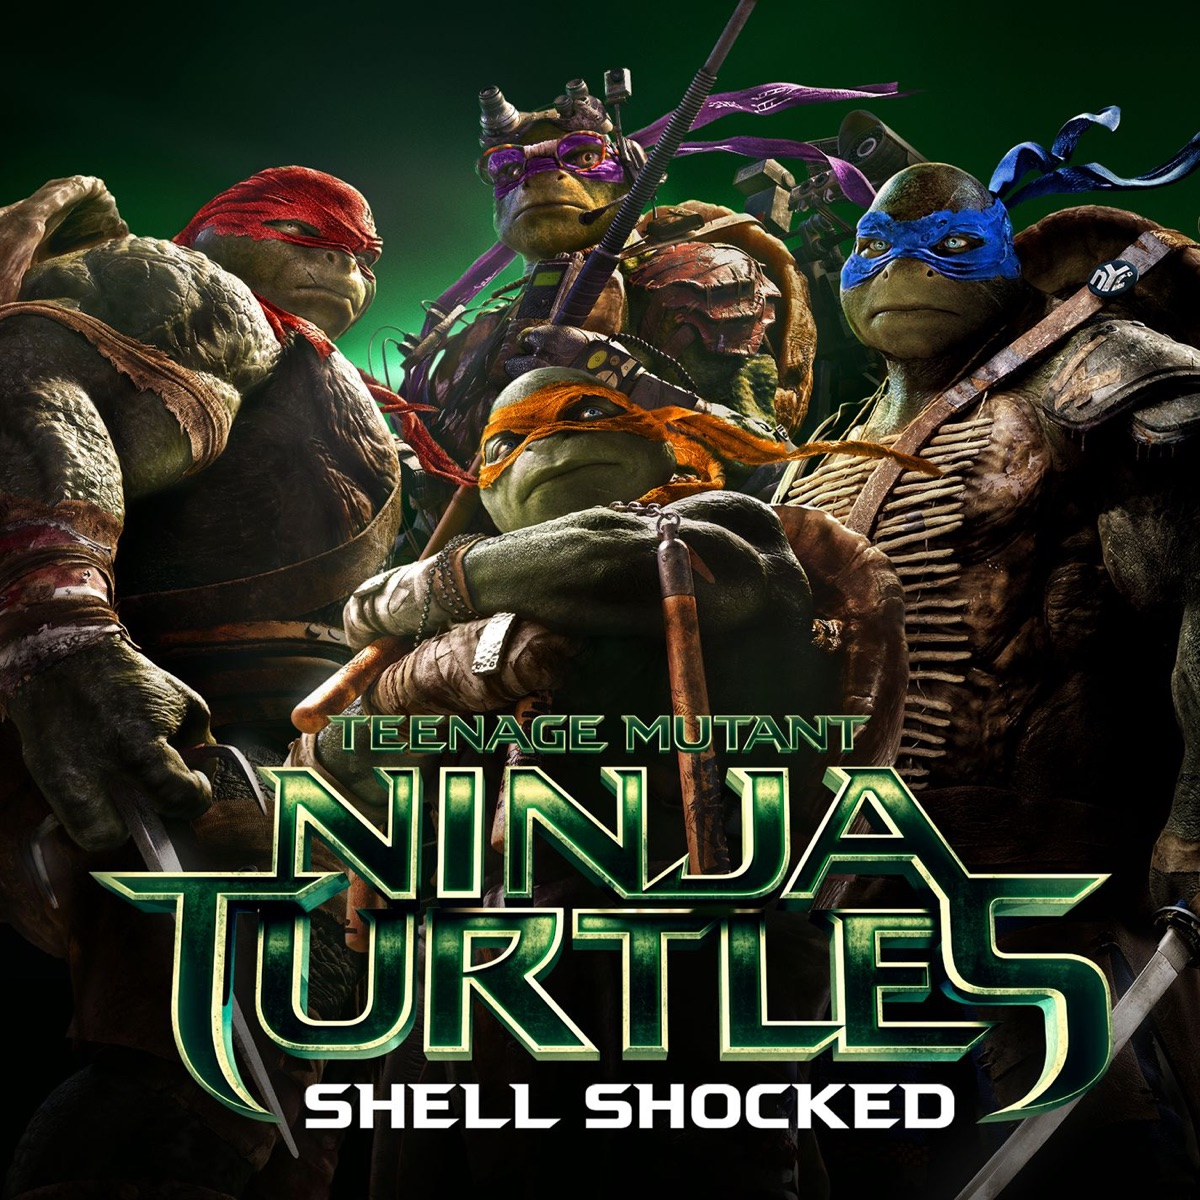 Shell Shocked feat Kill the Noise  Madsonik From Teenage Mutant Ninja Turtles - Single Juicy J Wiz Khalifa  Ty Dolla ign CD cover